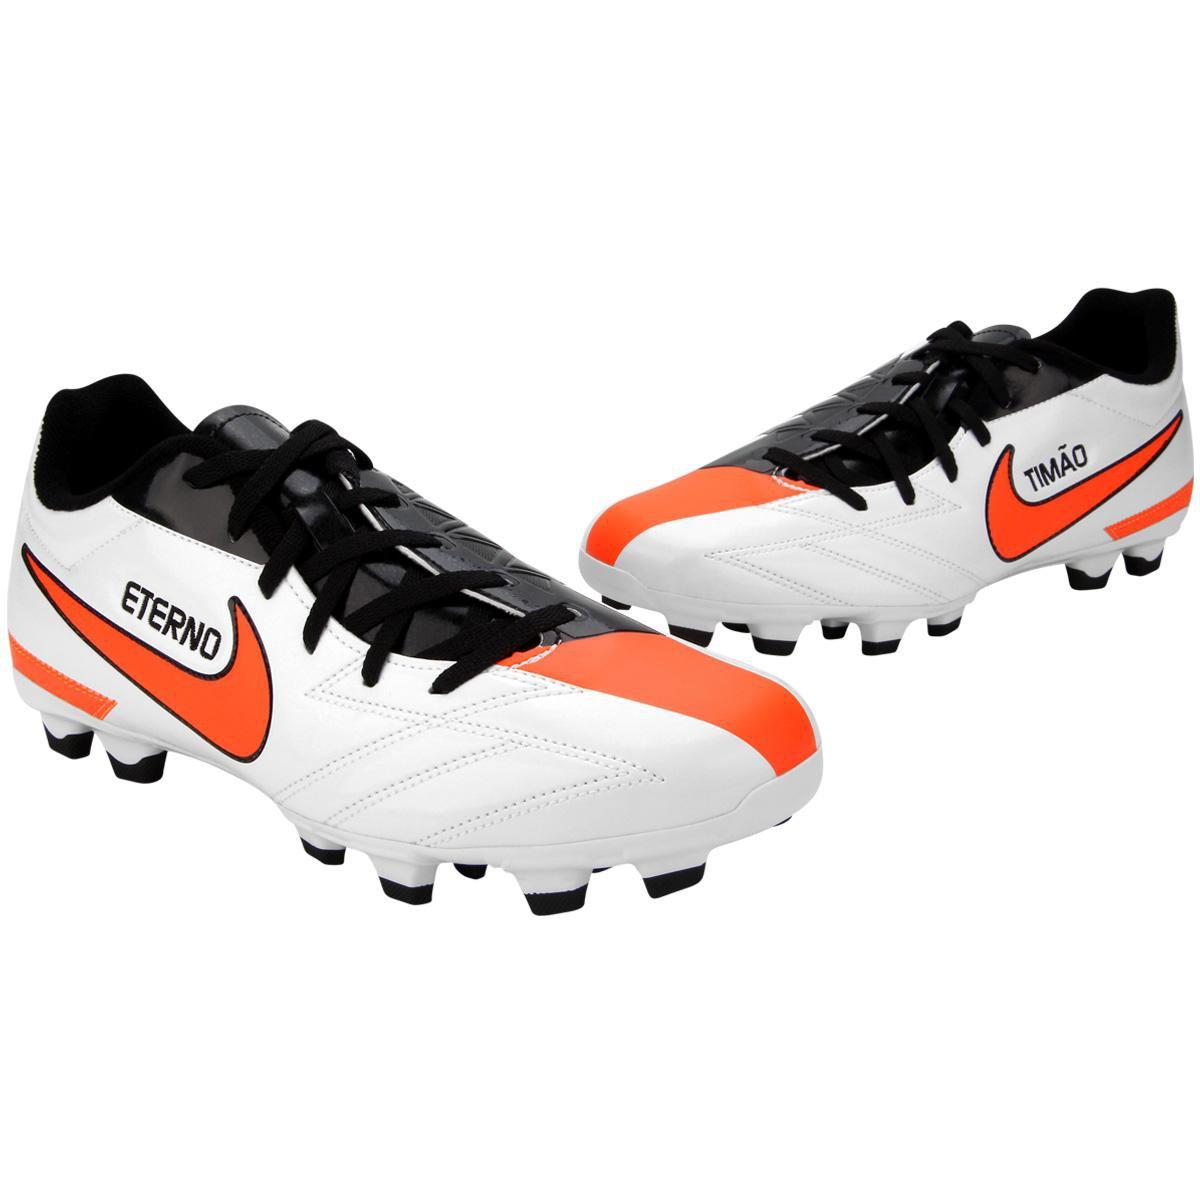 d901704785ae6 Chuteira Nike Total 90 Exacto 4 FG | Netshoes